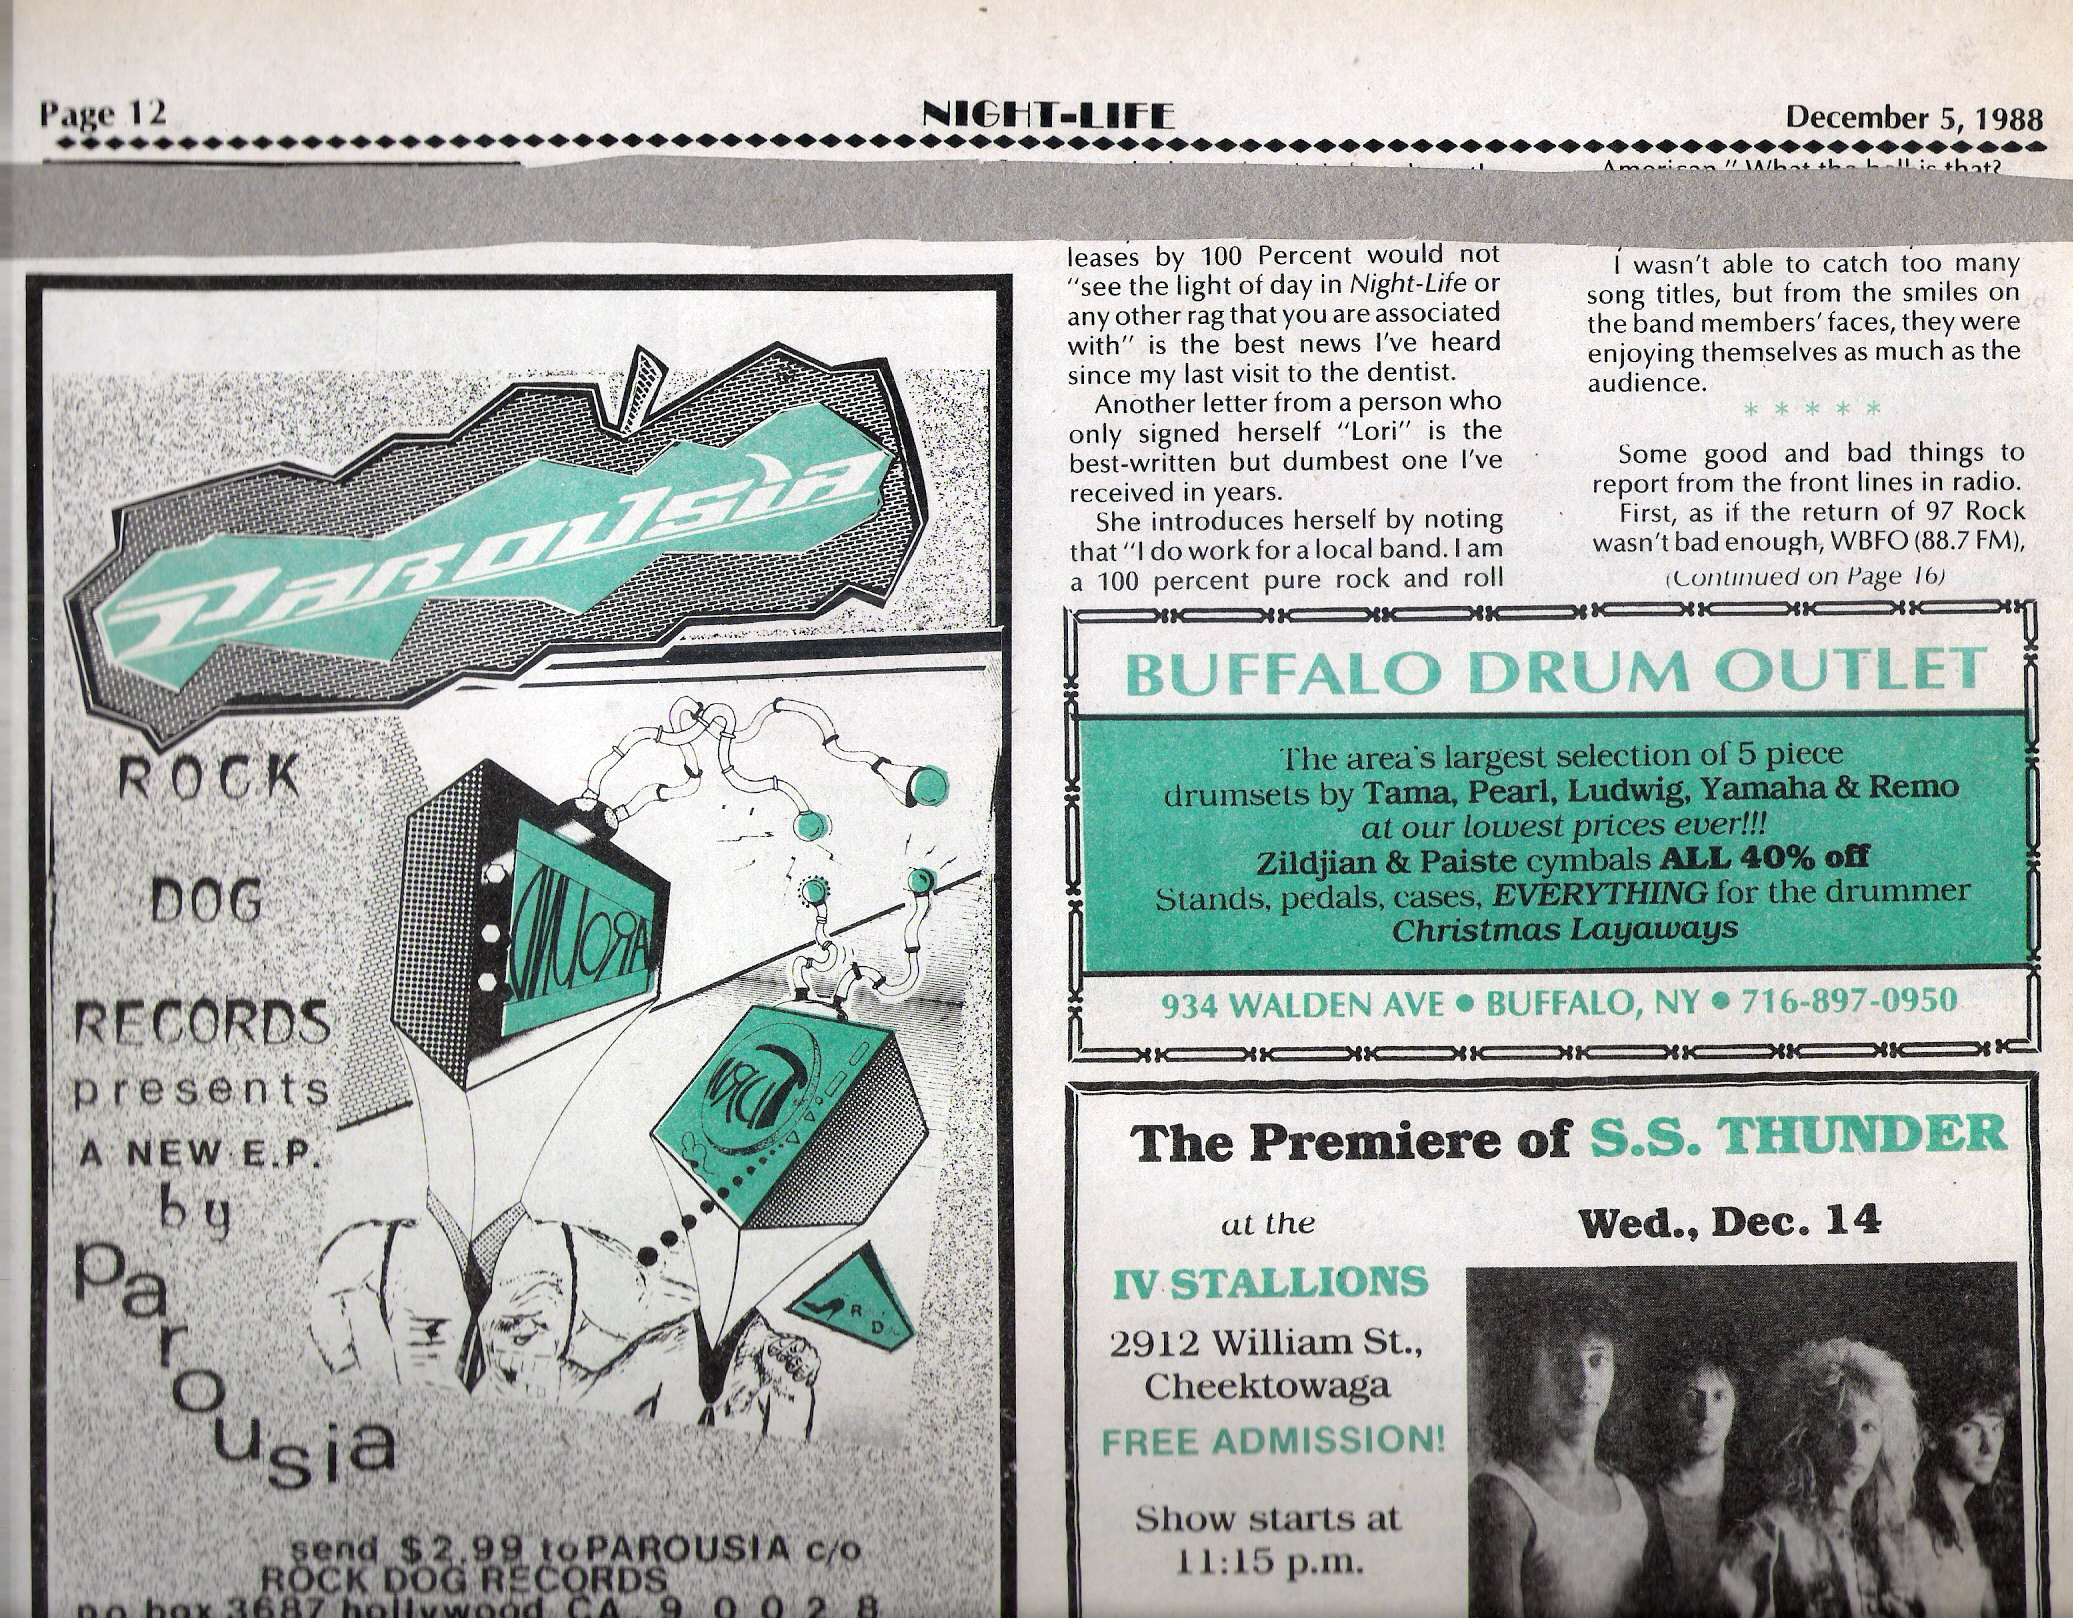 TURNAROUND EP: Buffalo Night-Life Dec. 1988